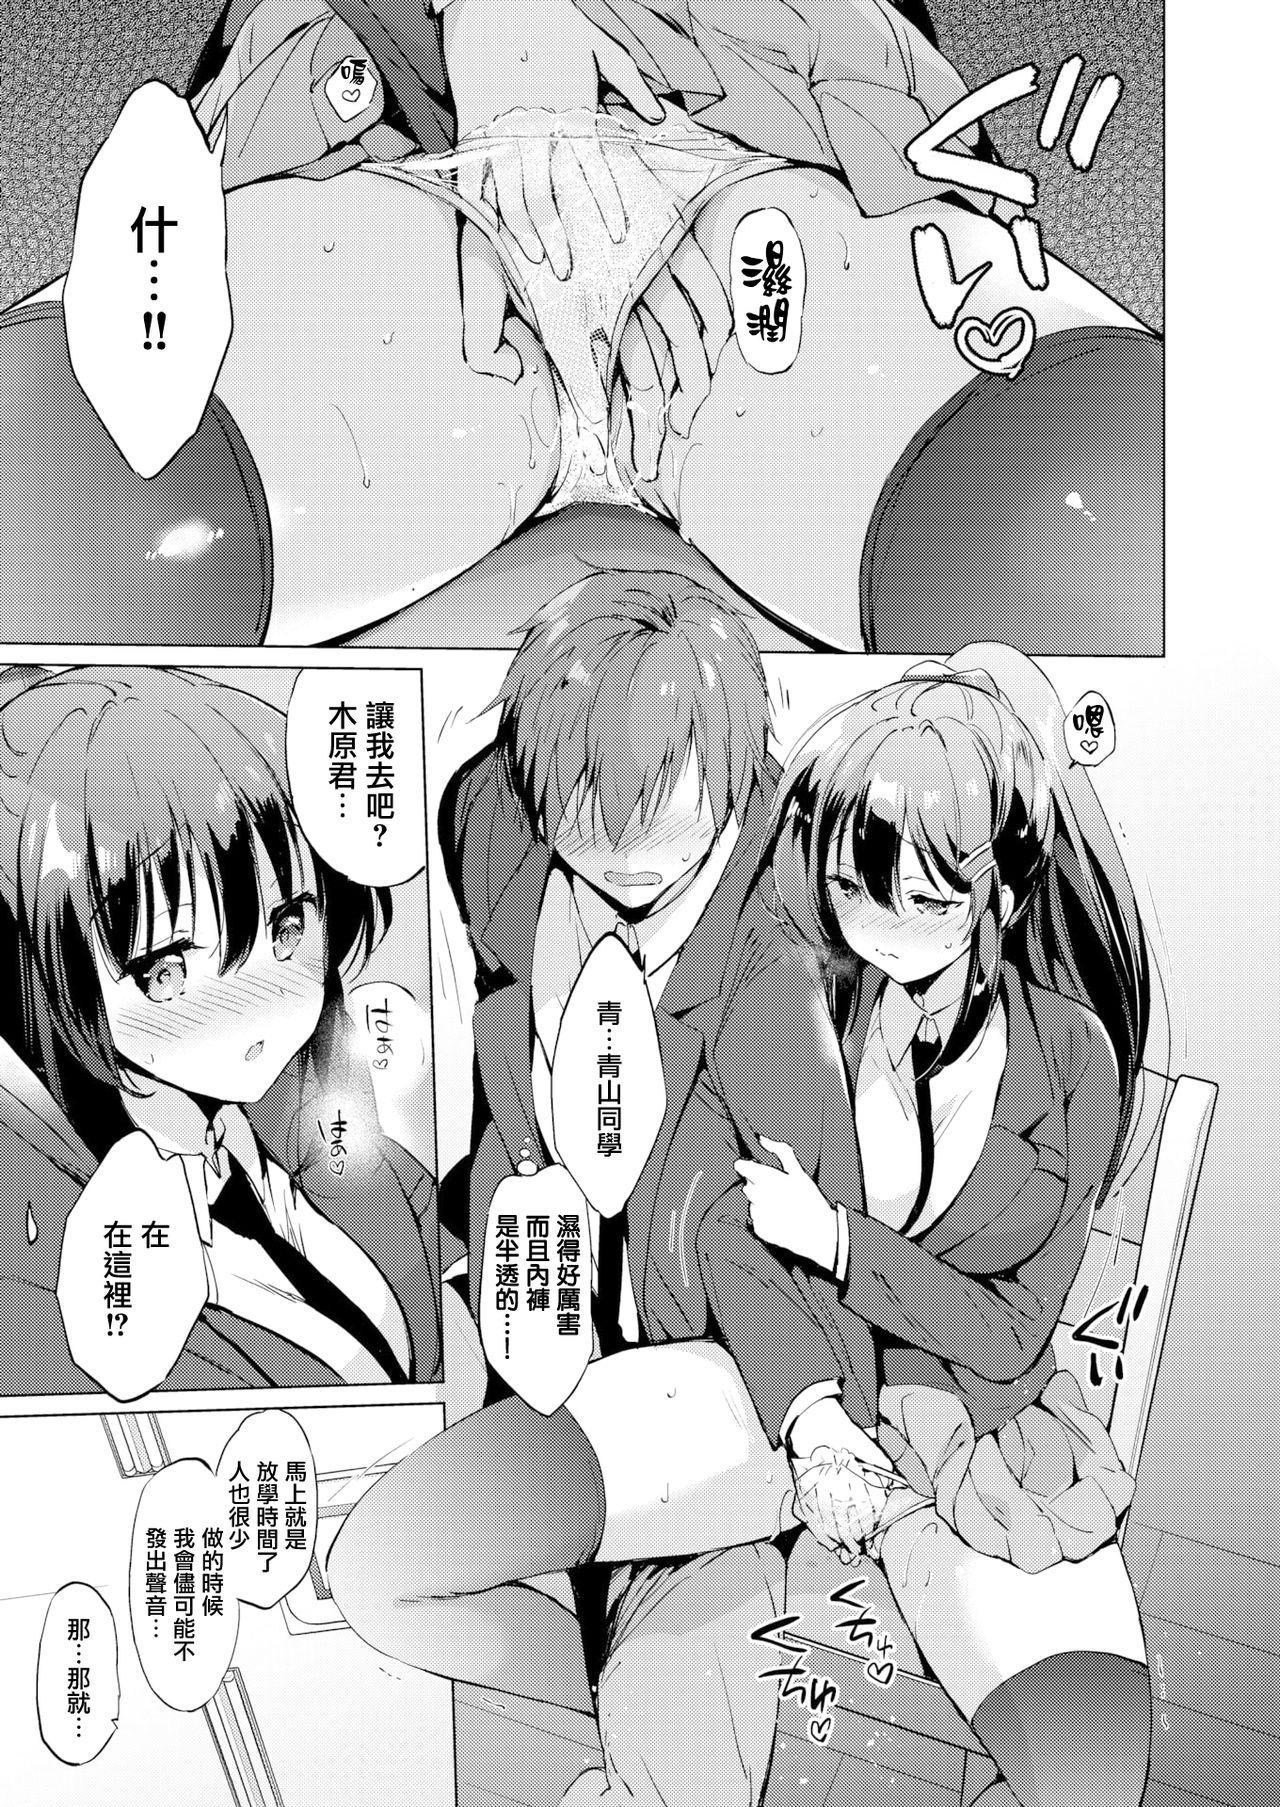 Hodokeru Kanojo - lovable & sensitive girlfriend 3